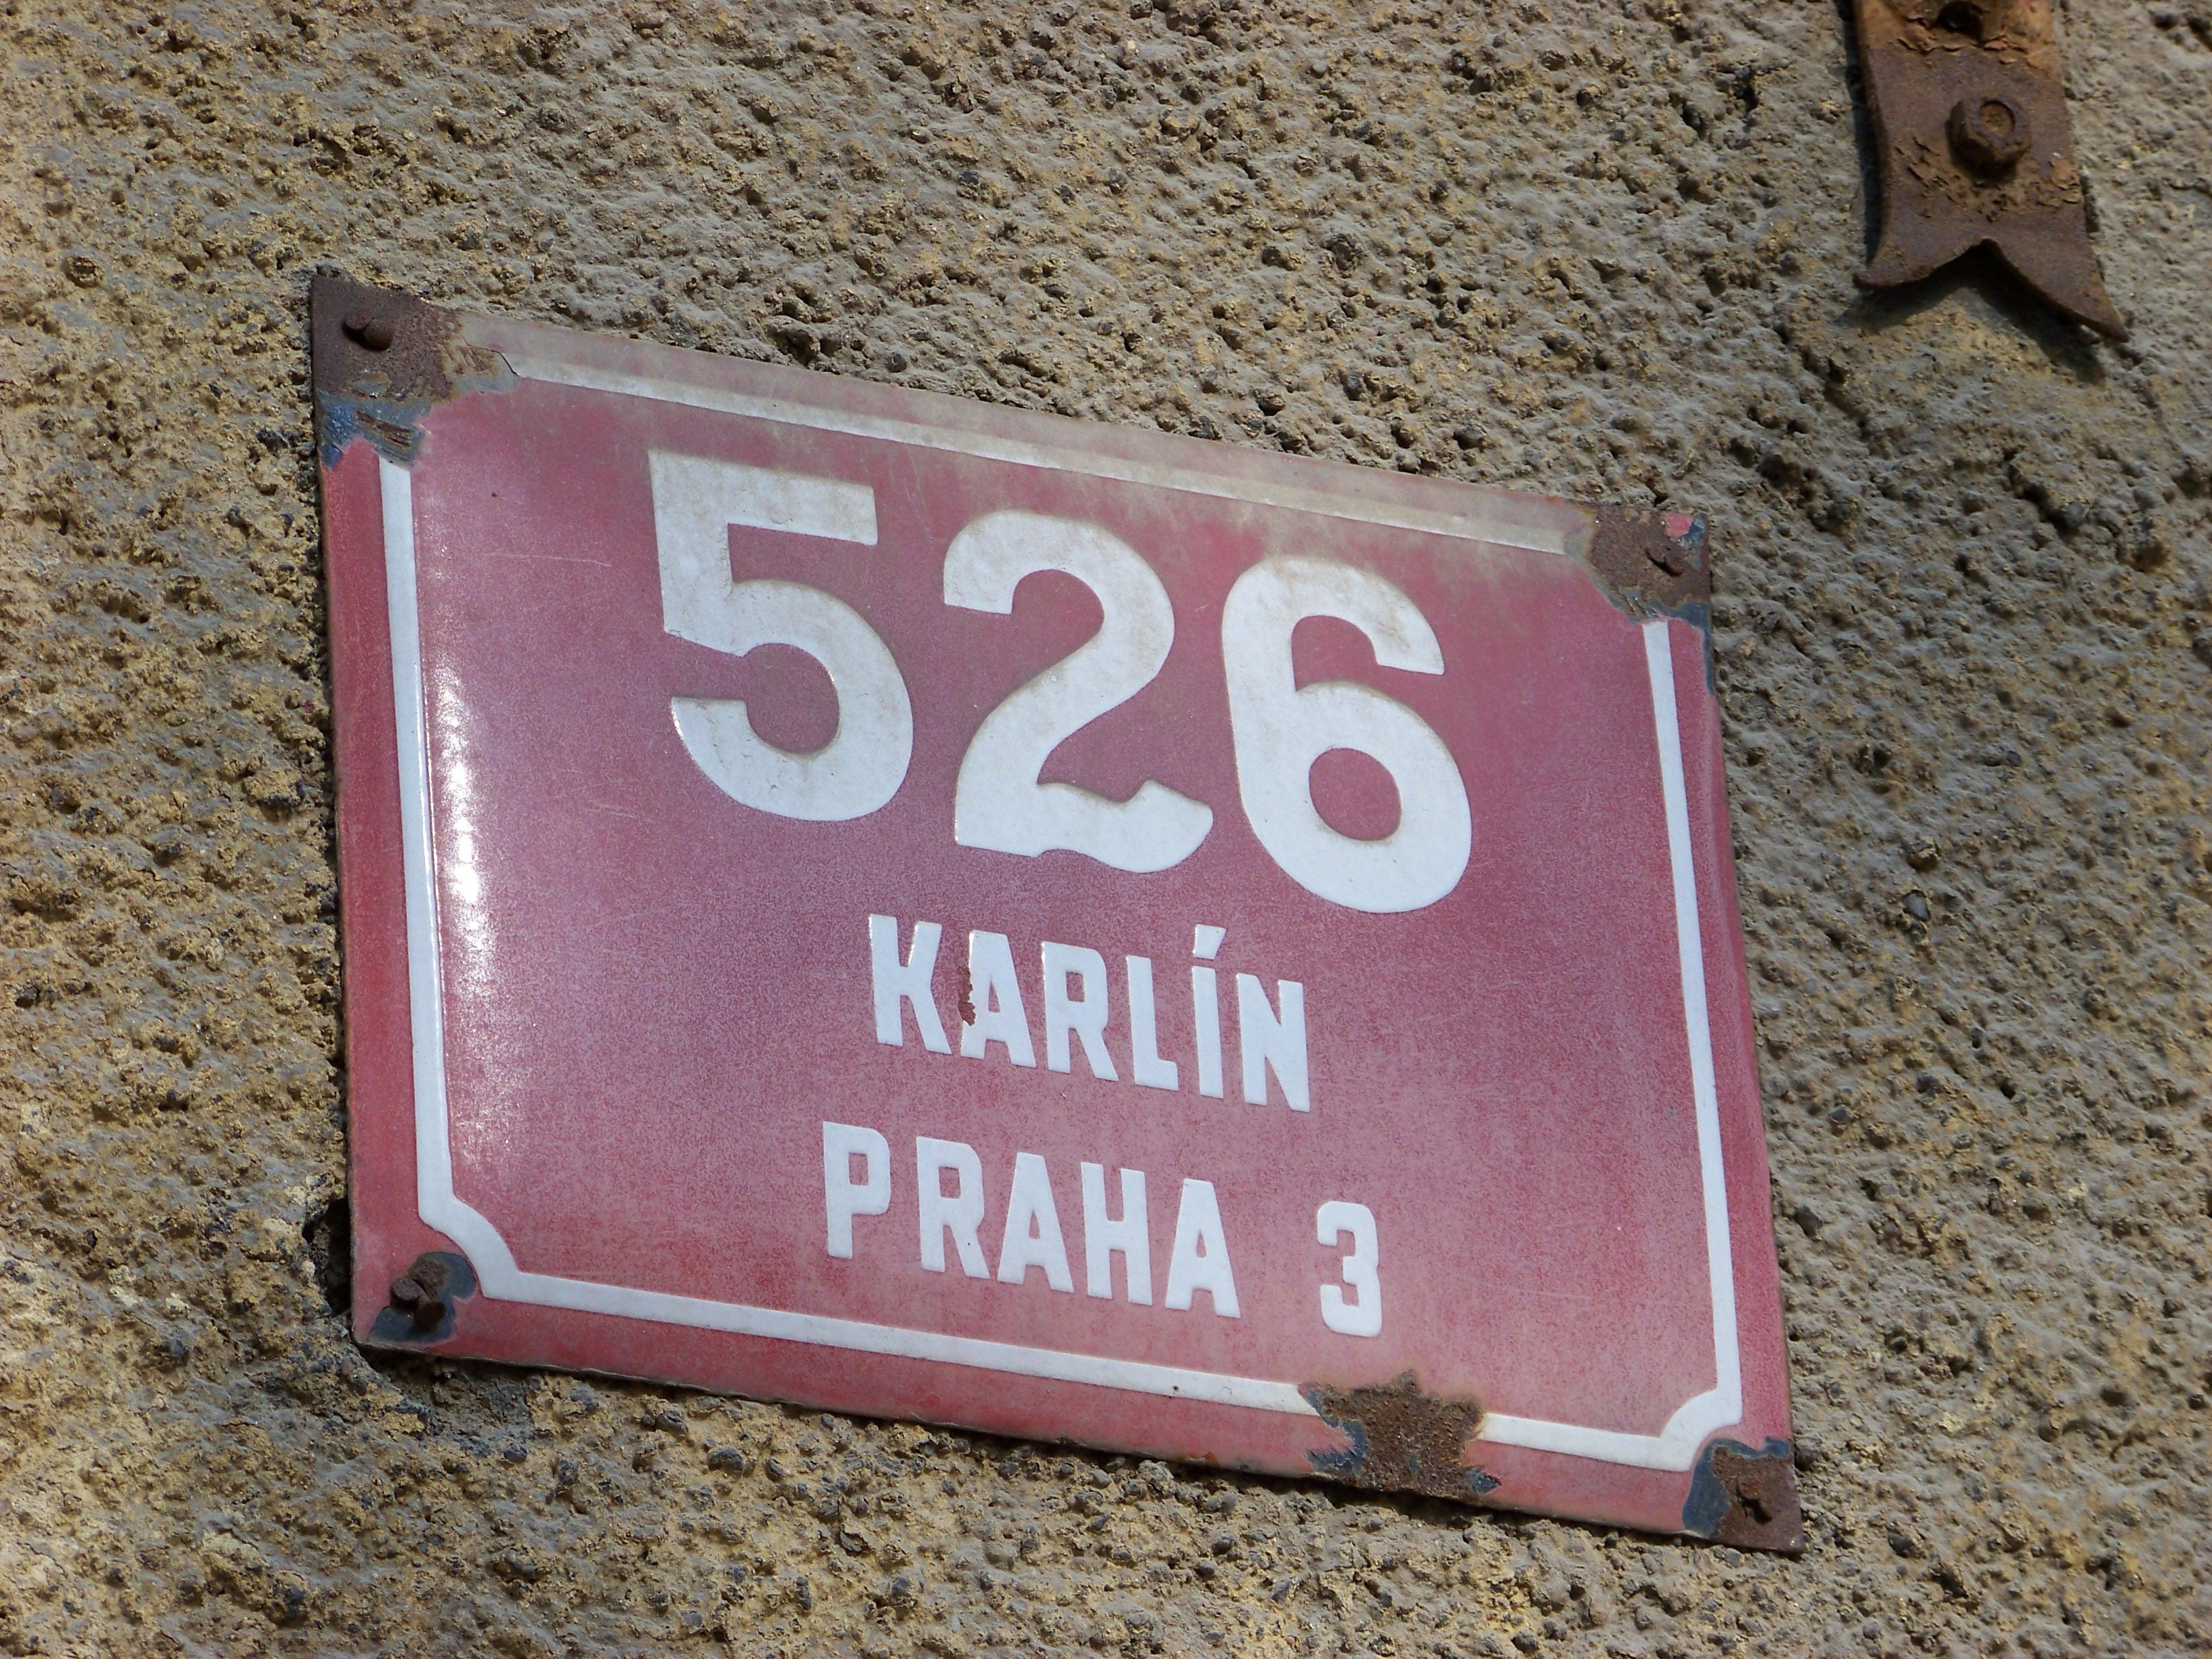 File:Karlín 526.jpg